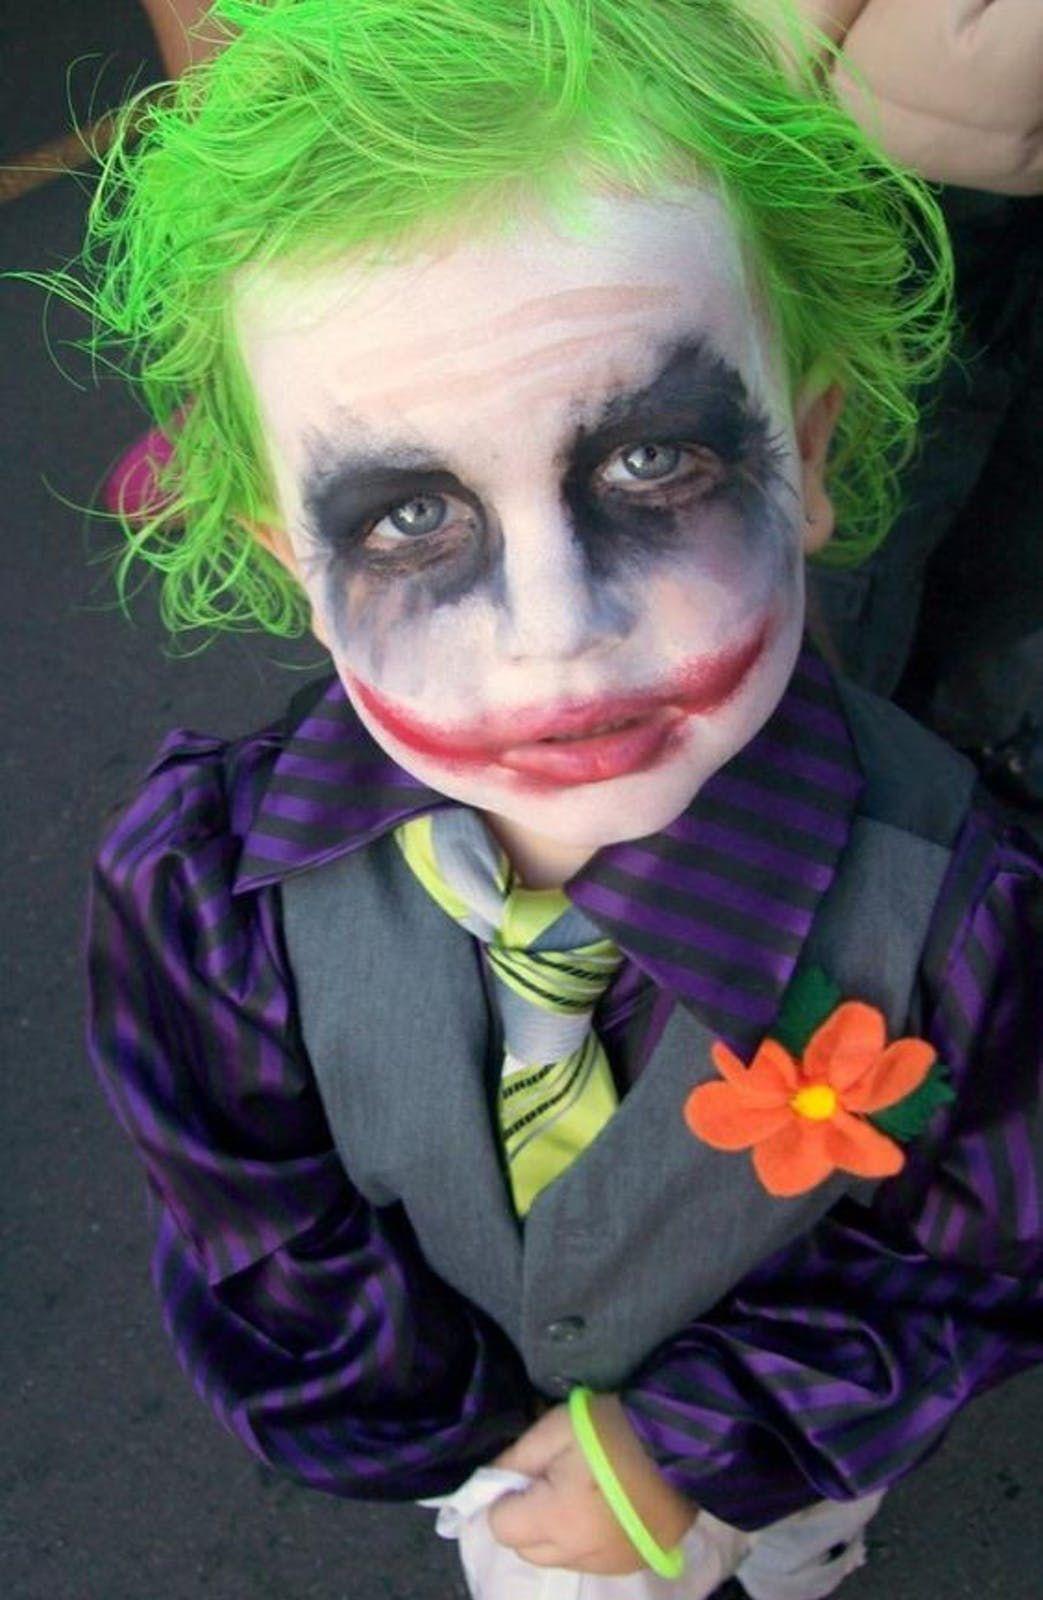 Quatang Gallery- Les Costumes D Halloween Qui Nous Feraient Rire Diaporama Maquillage Halloween Enfant Maquillage Halloween Idees De Maquillage Halloween